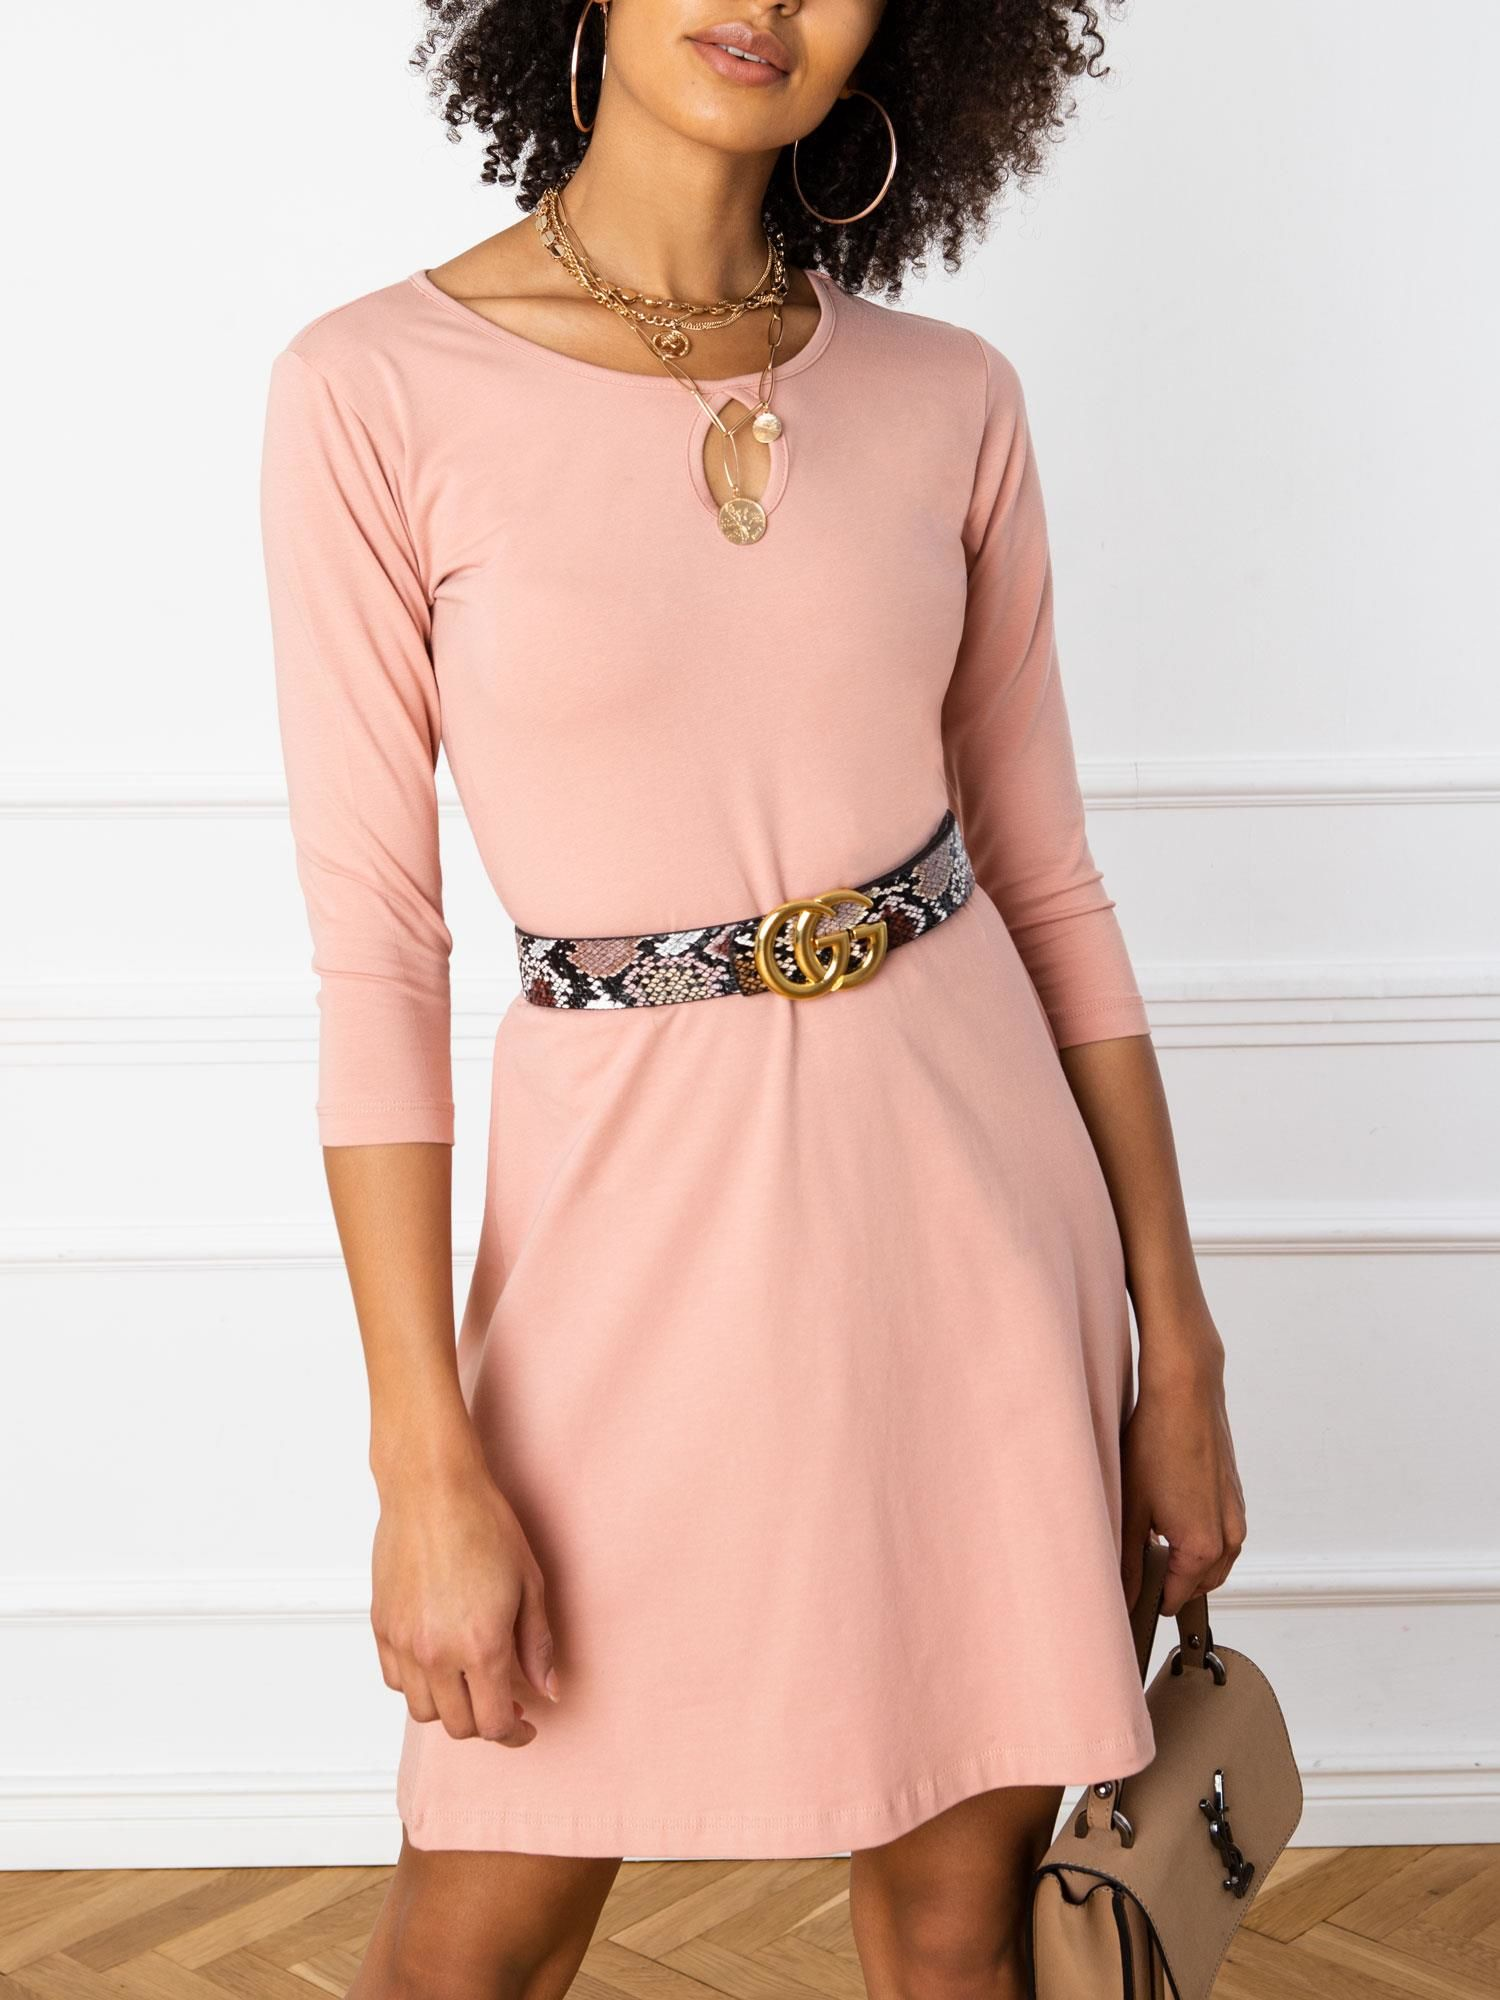 Jednoduché krátke ružové šaty - M